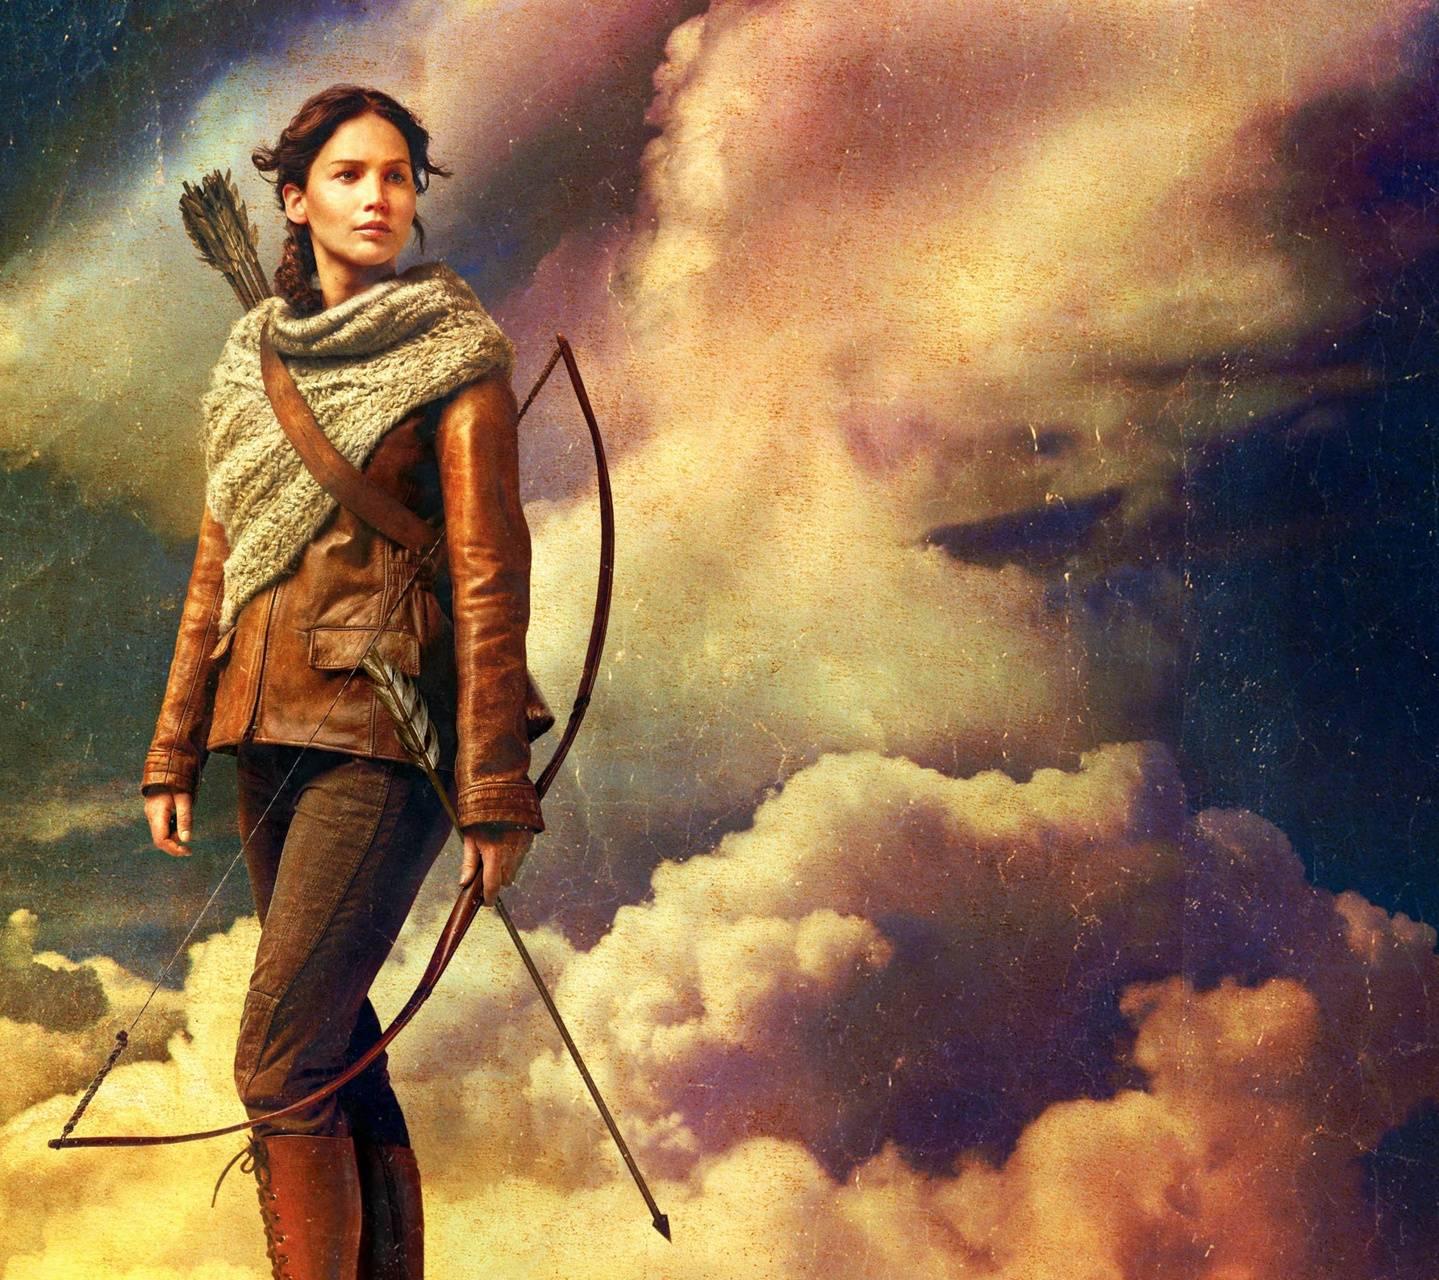 Katniss Evedean